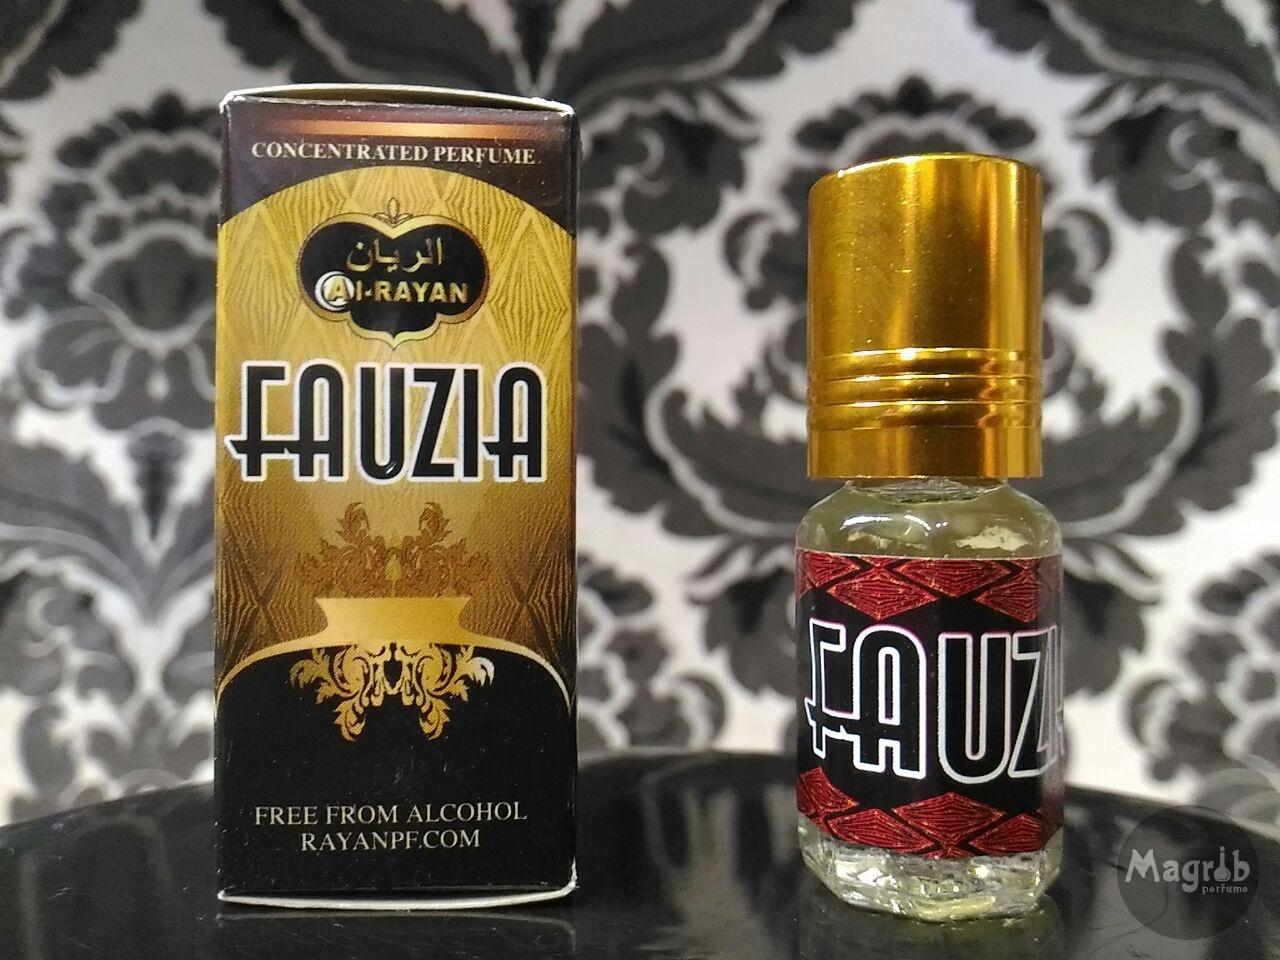 Al-Rayan Fauzia 3ml- концентрированные масляные духи.